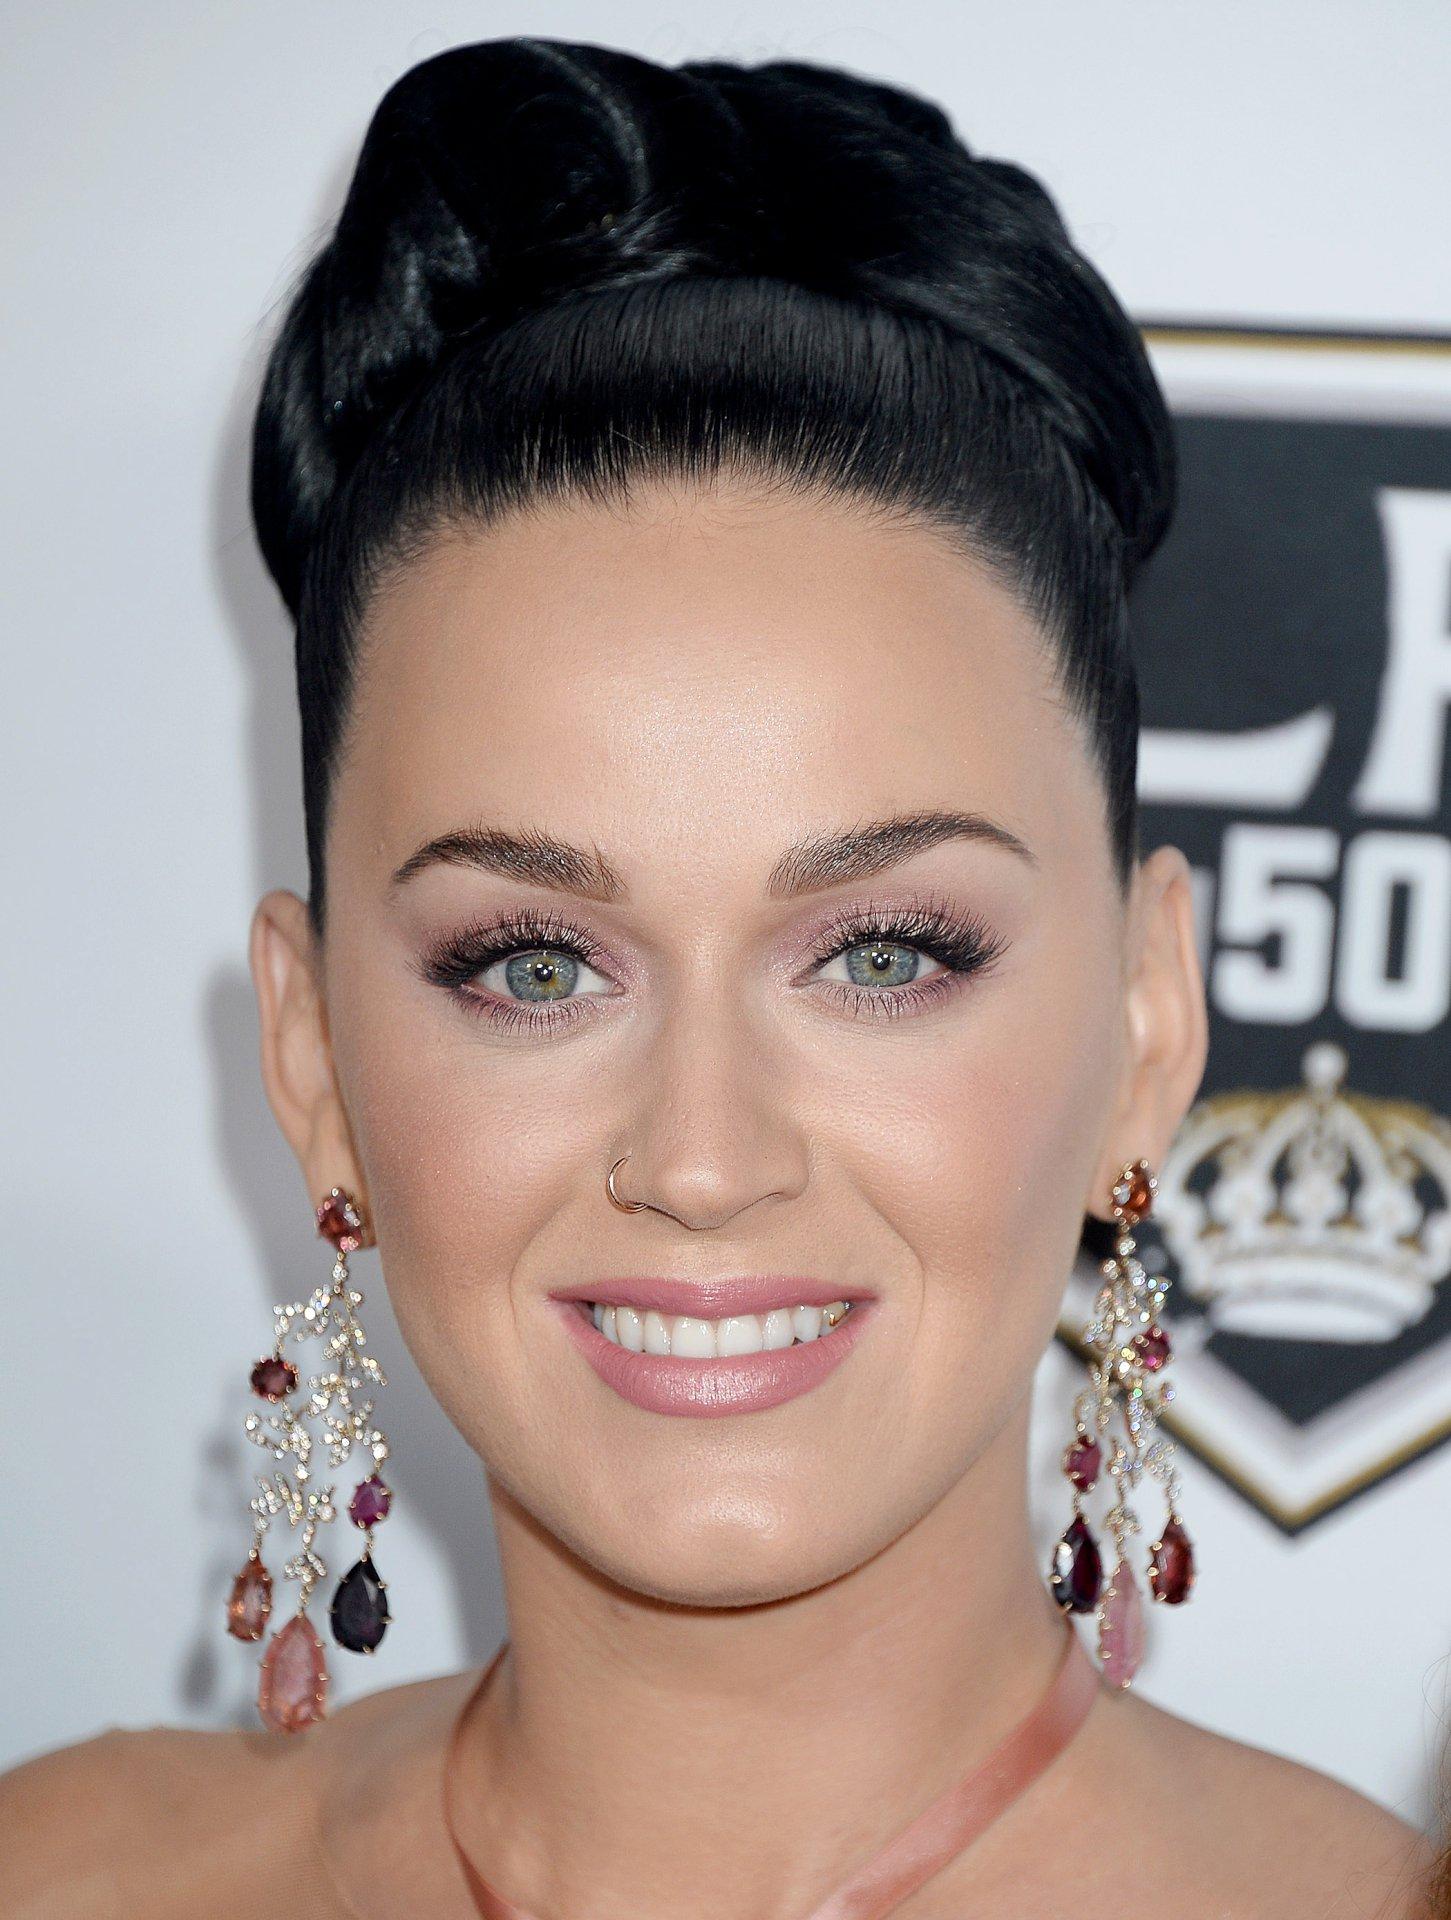 katy-perry-1 | Hot Celebs Home Katy Perry